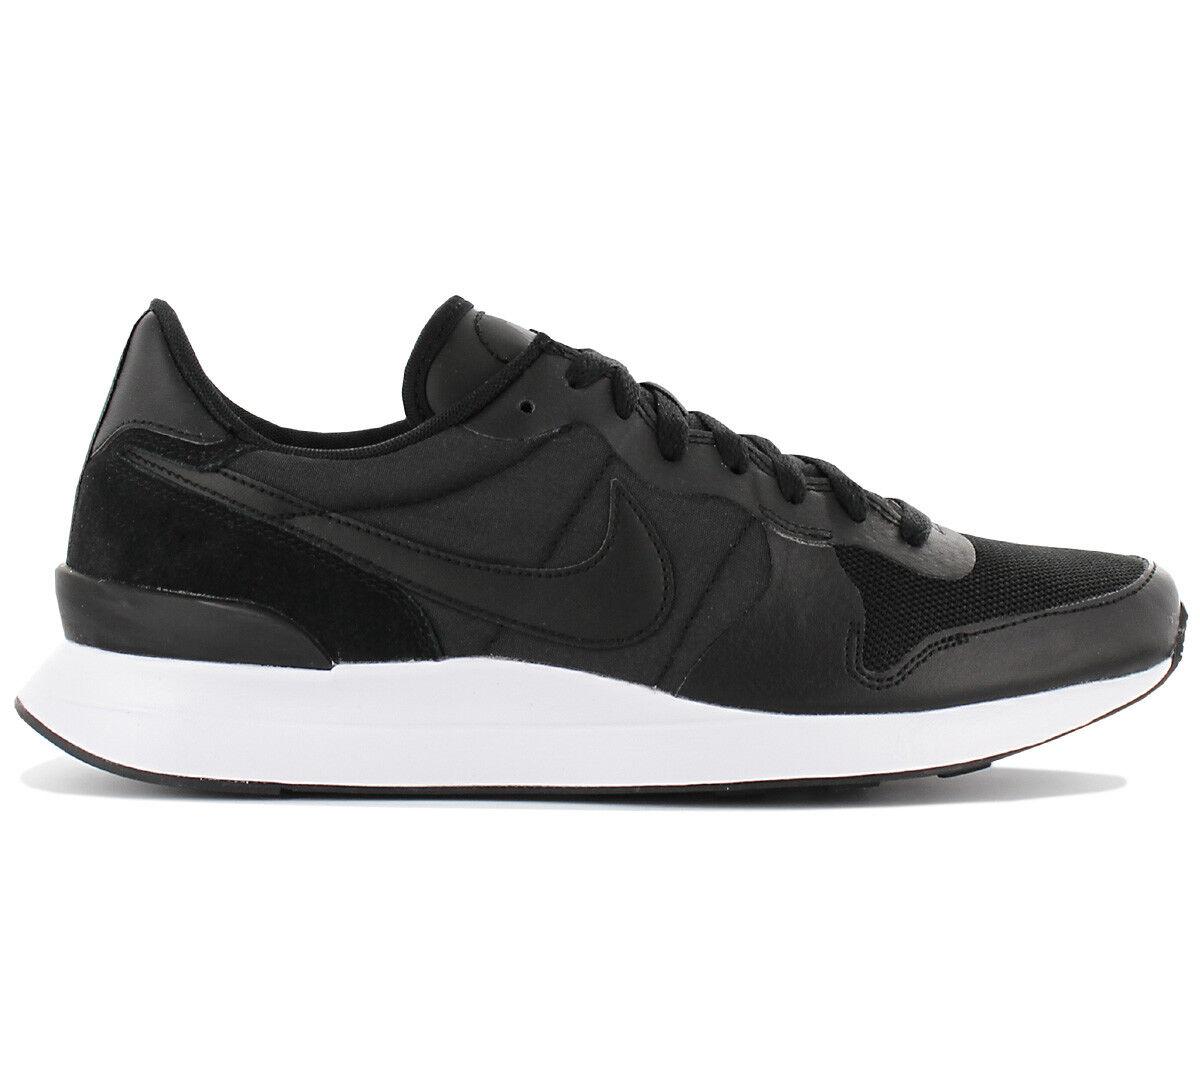 Nike Internationalist Lt 17 Men's Sneakers Retro shoes Black Vortex 872087-002